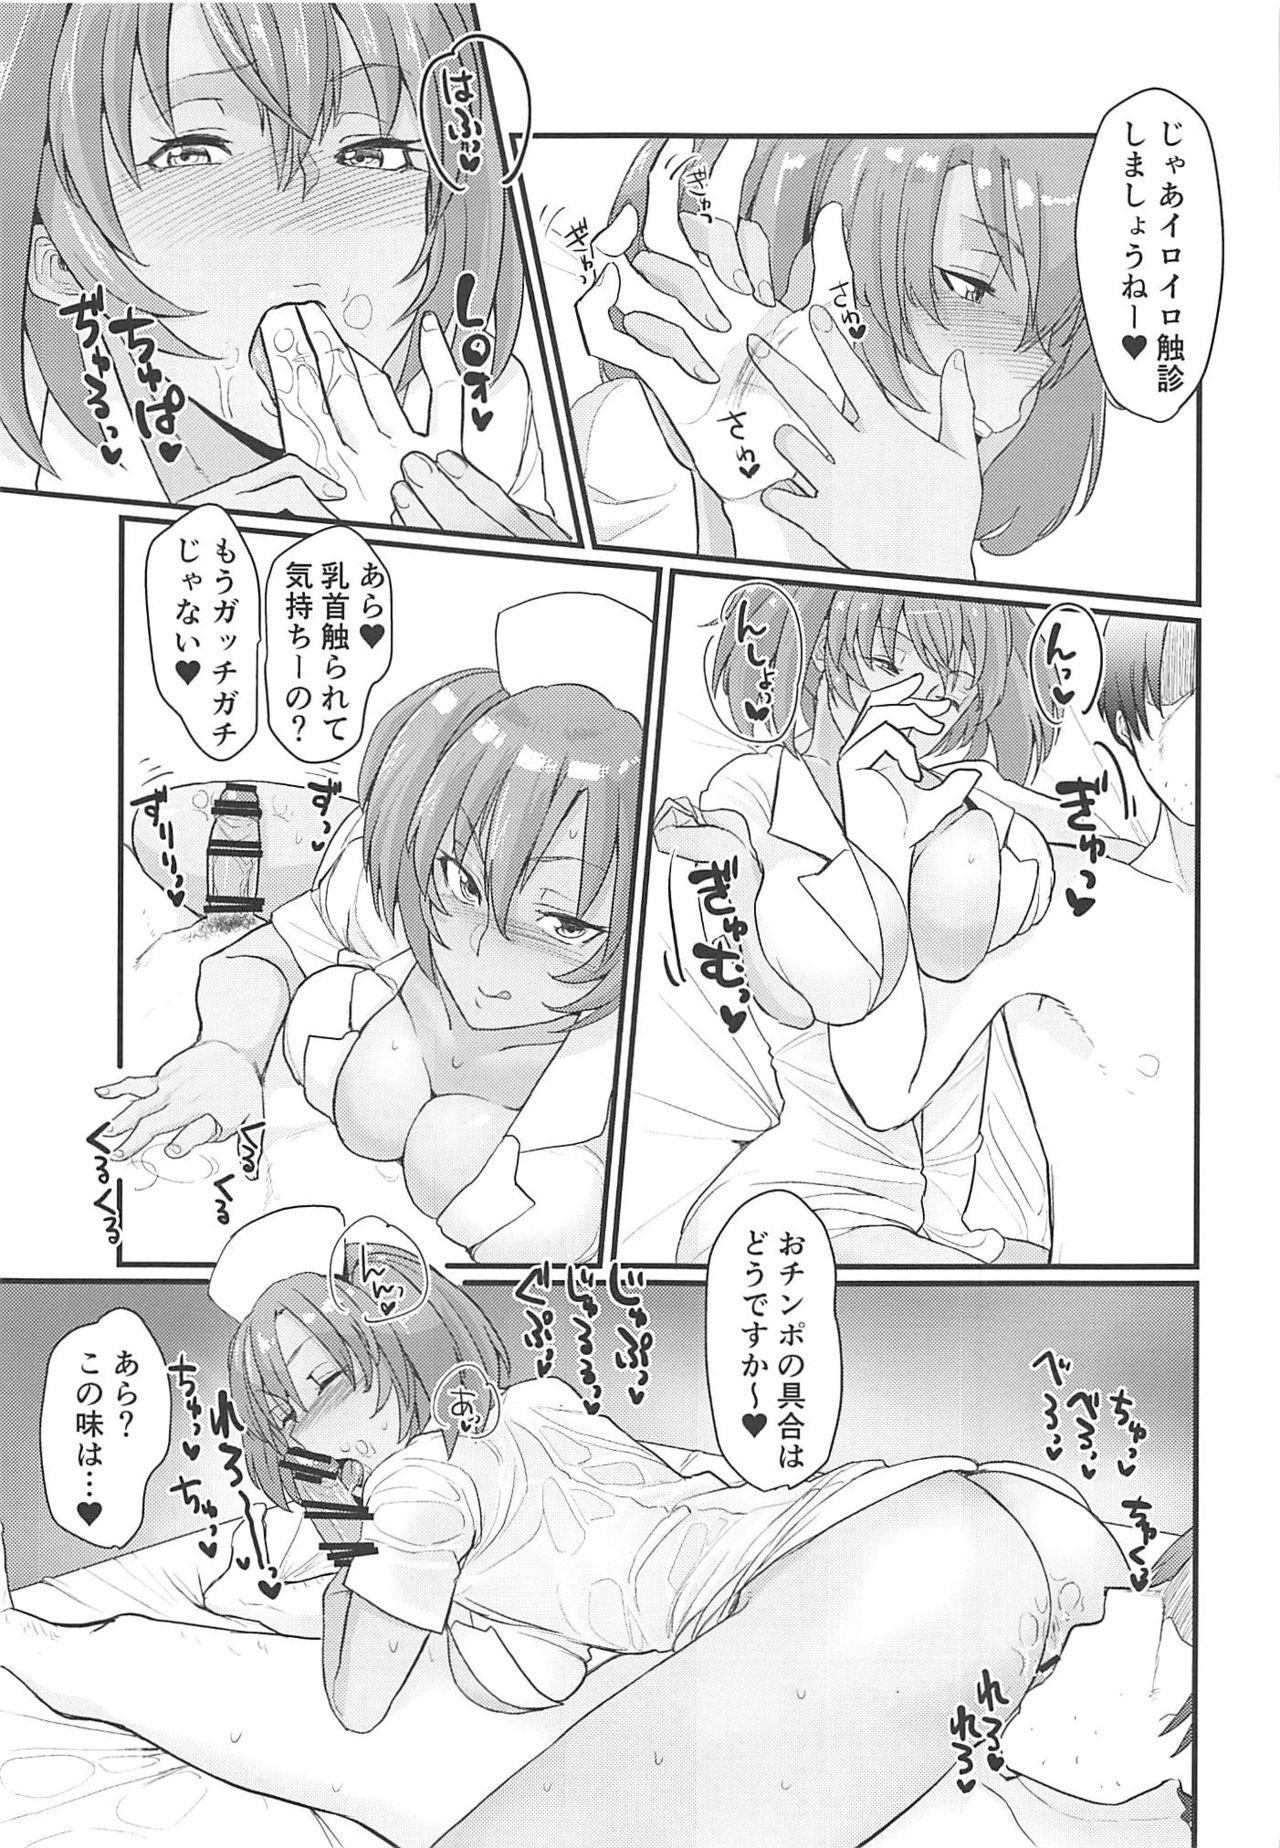 Ryofu Housen to Love Love Ofurox + Nurse Cos 21